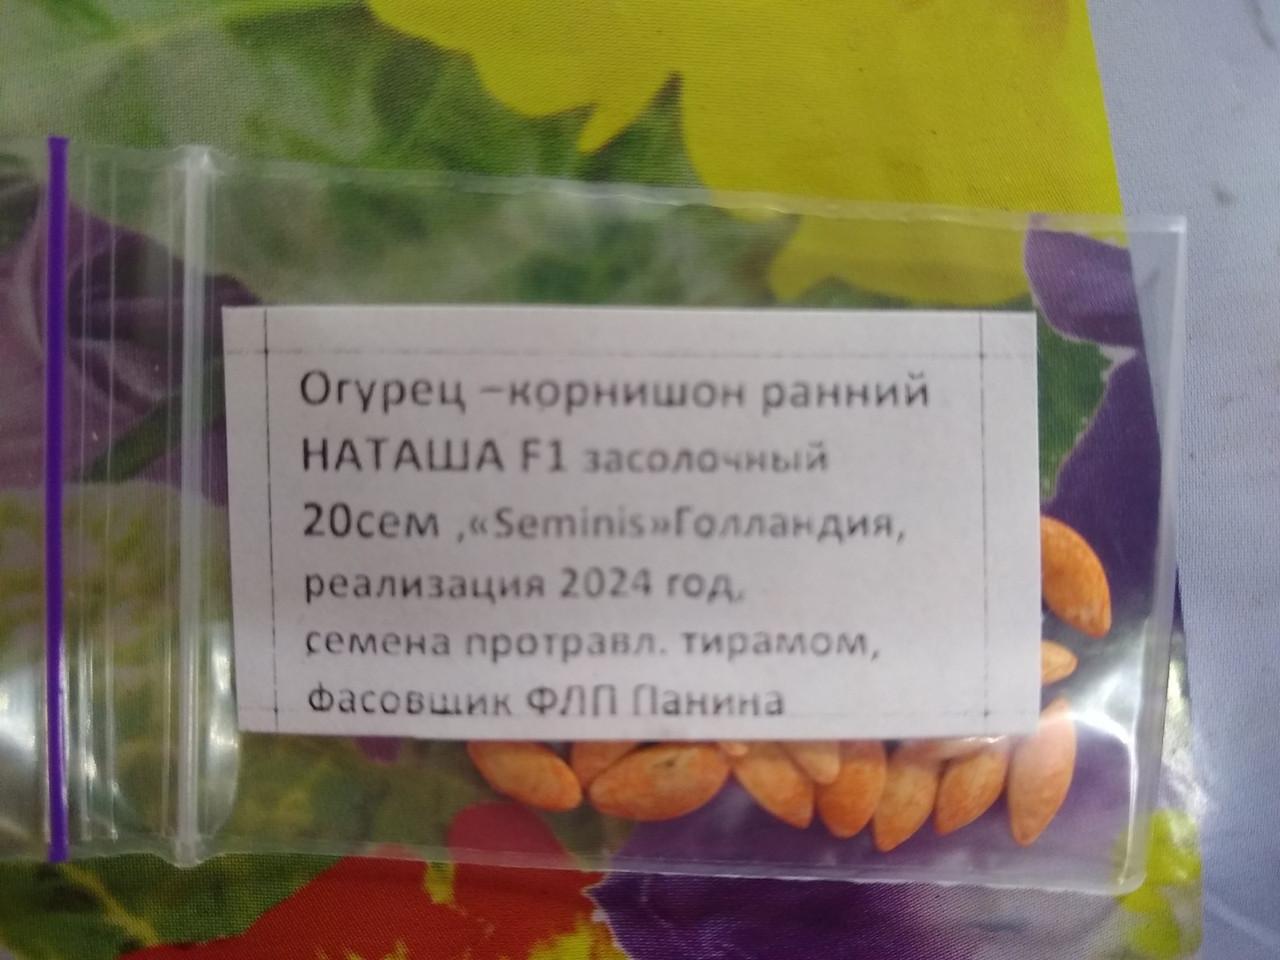 Семена Огурец корнишон гибрид ранний Наташа F1 засолочный 20 семян Seminis Голландия